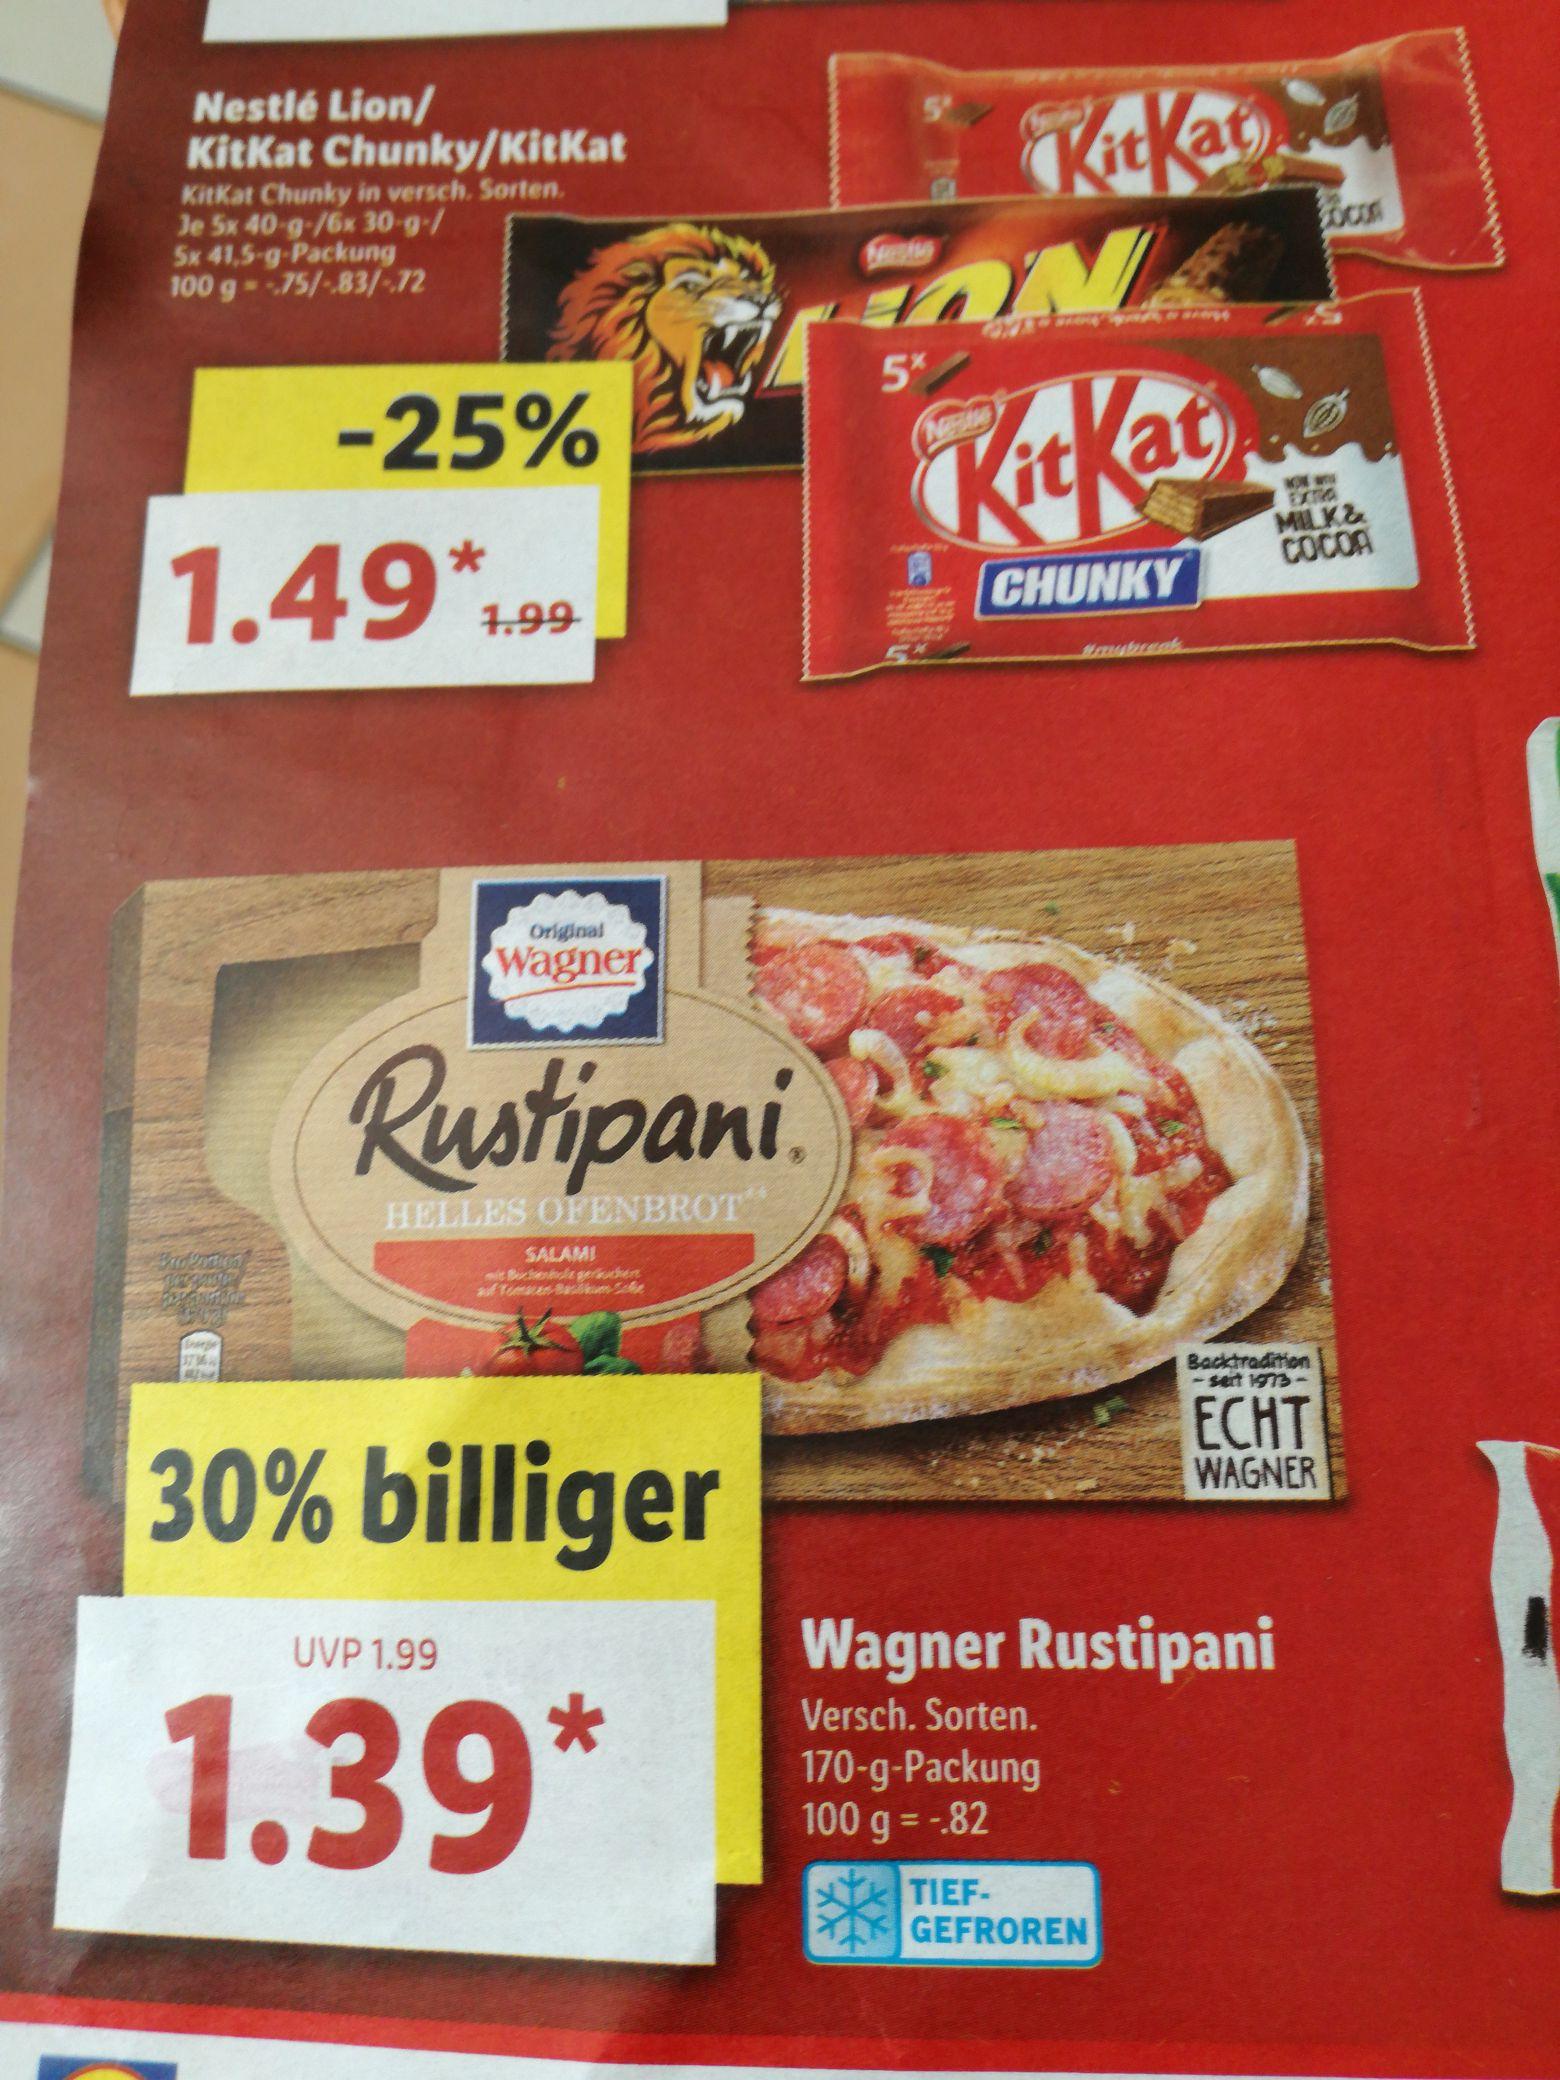 (LIDL) Wagner Rustipani